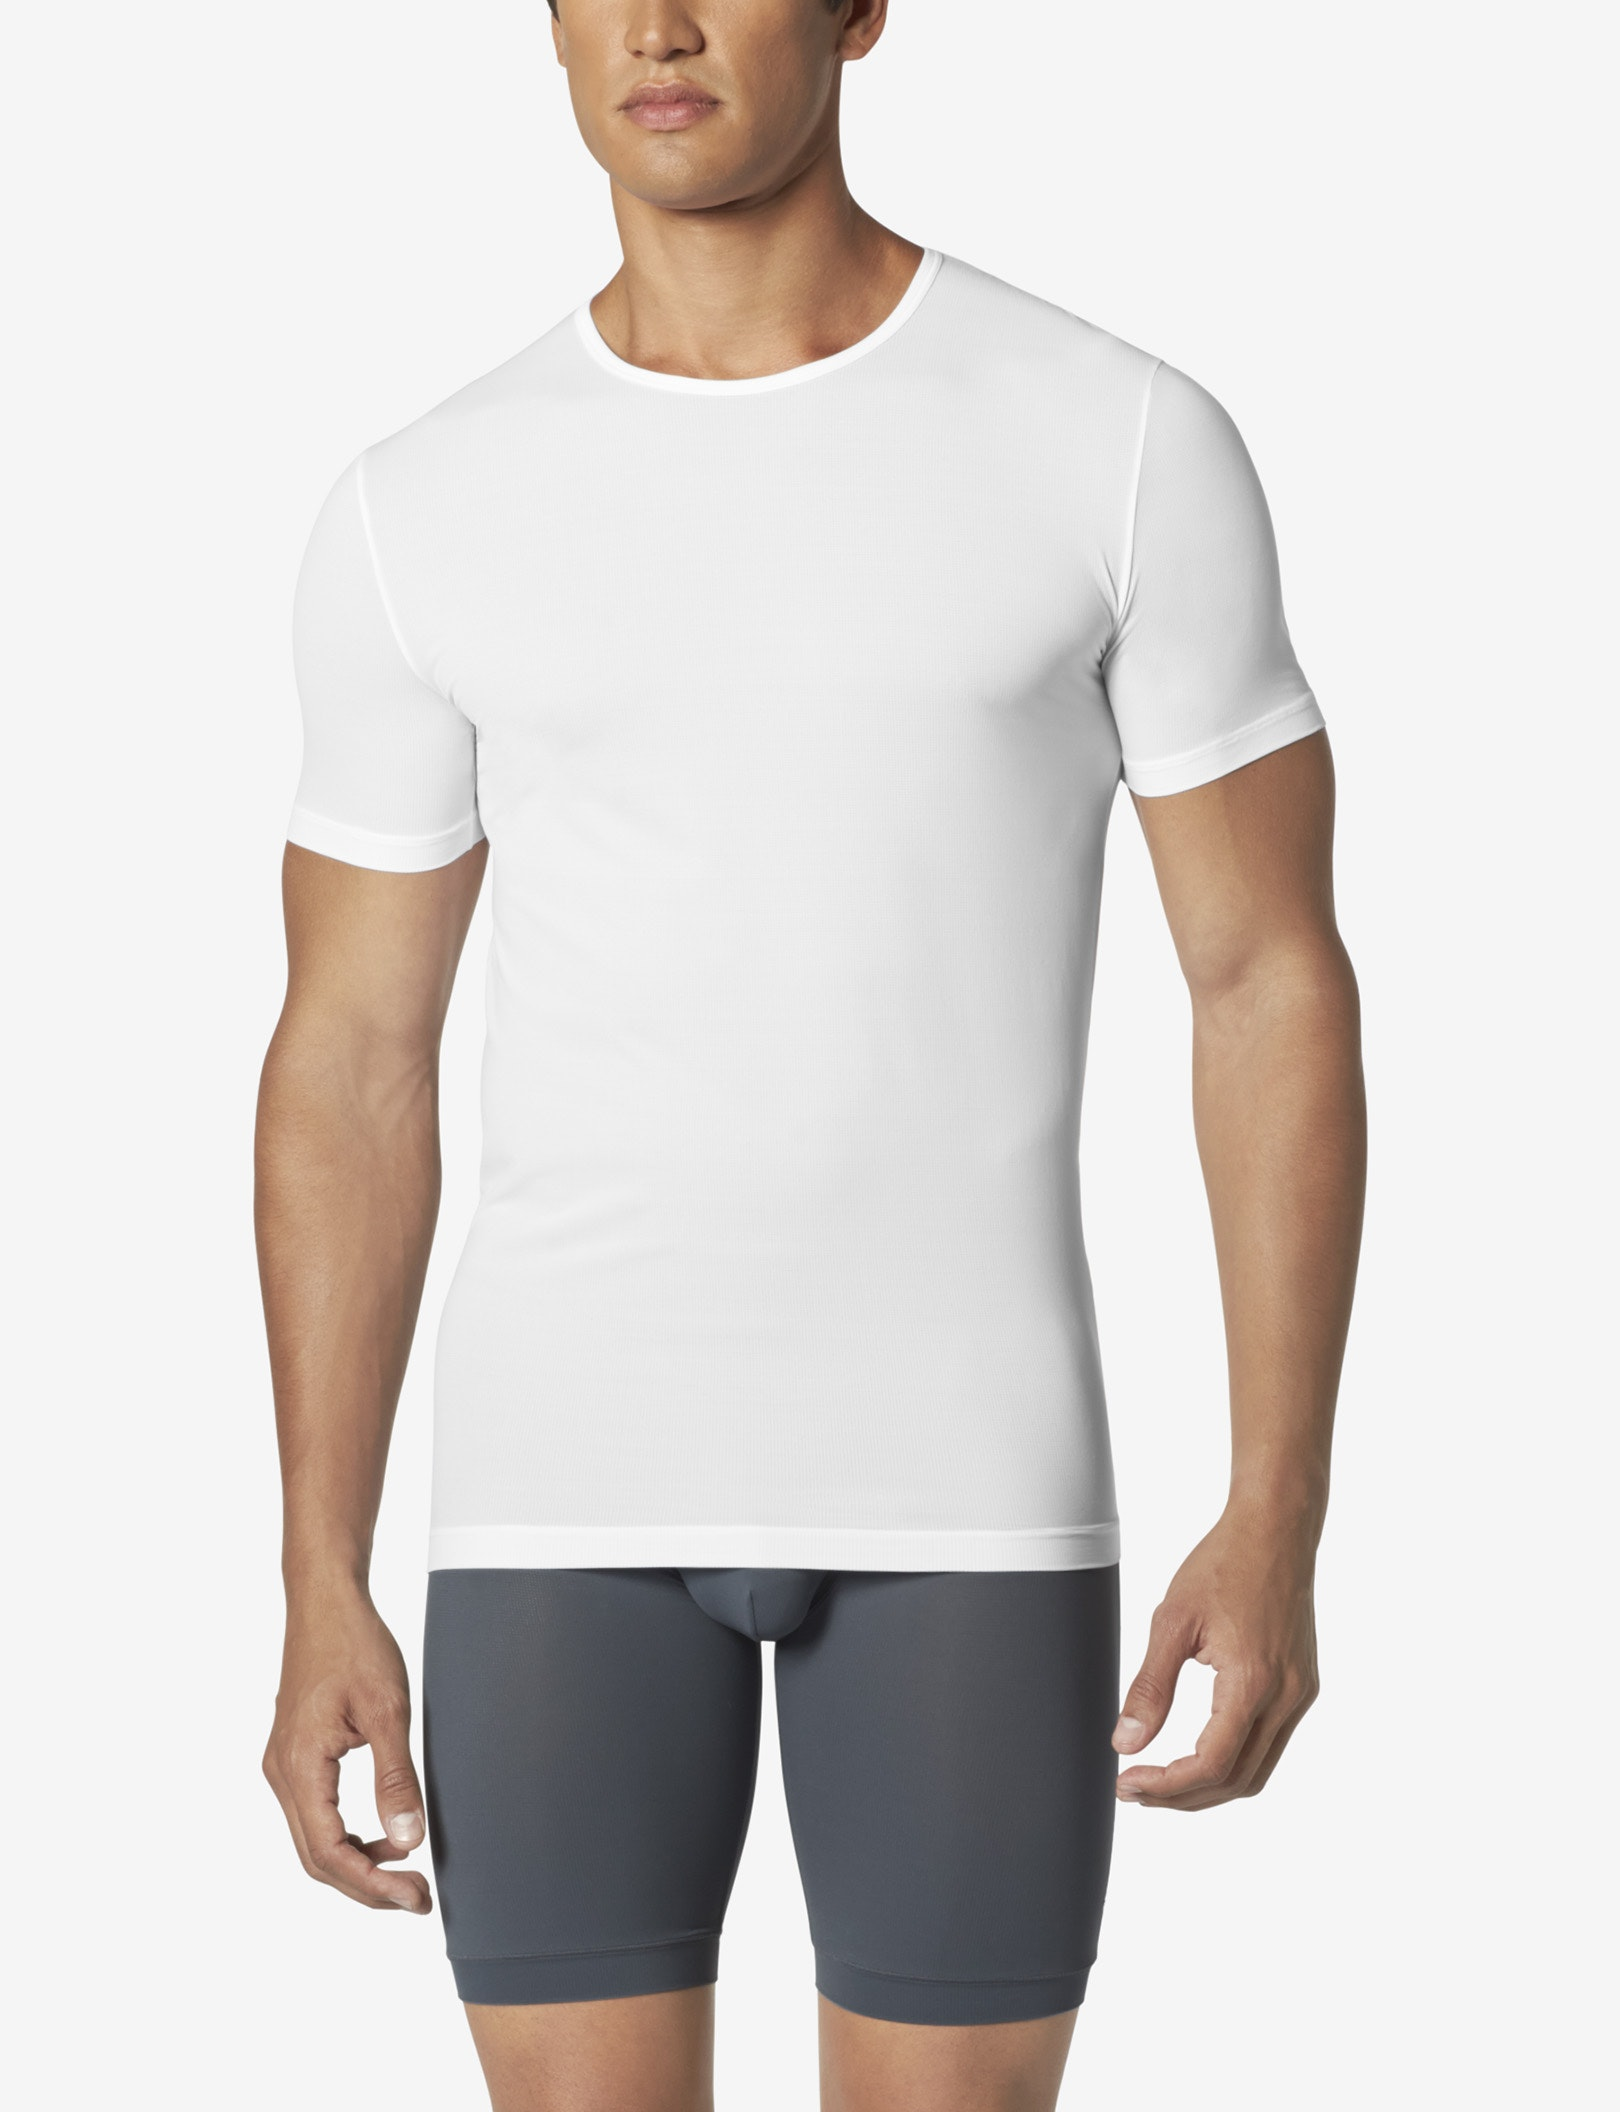 Air Crew Neck Stay Tucked Undershirt Light Undershirt